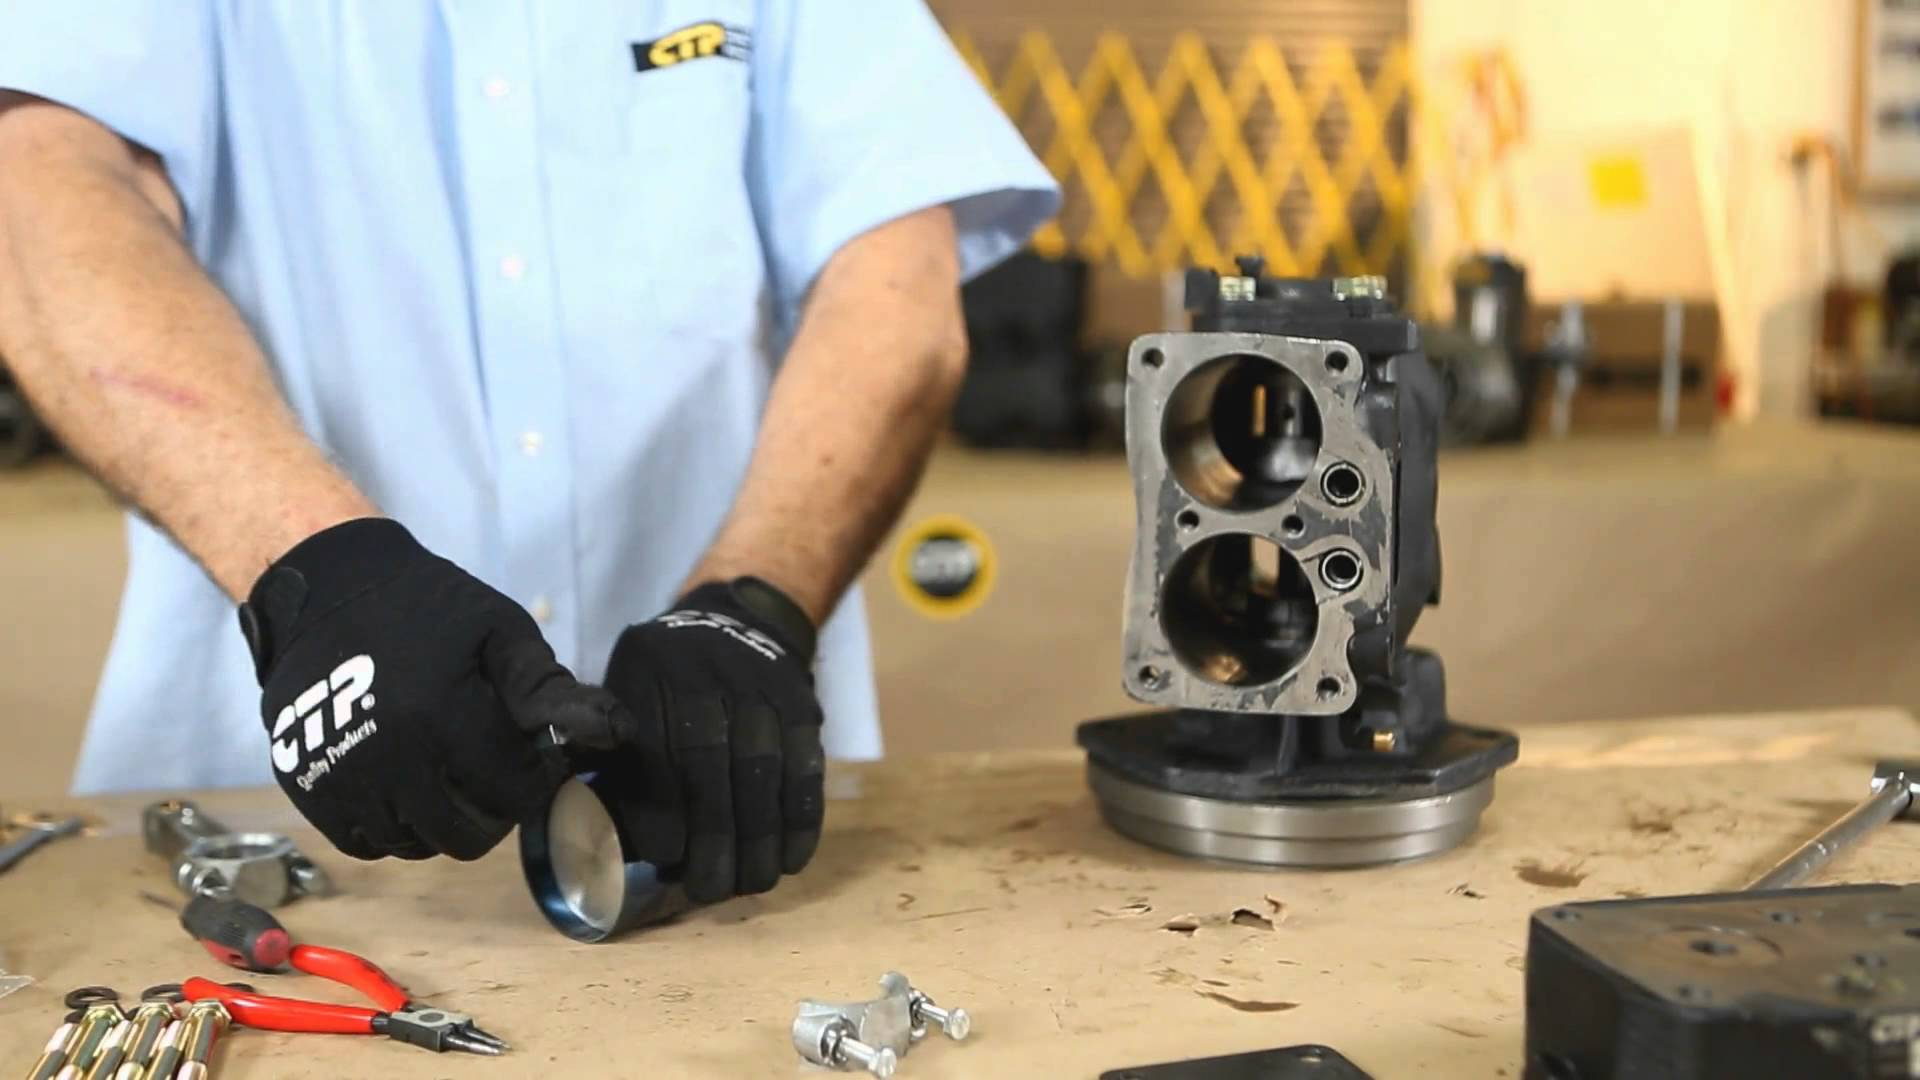 Overhaul an Air Compressor